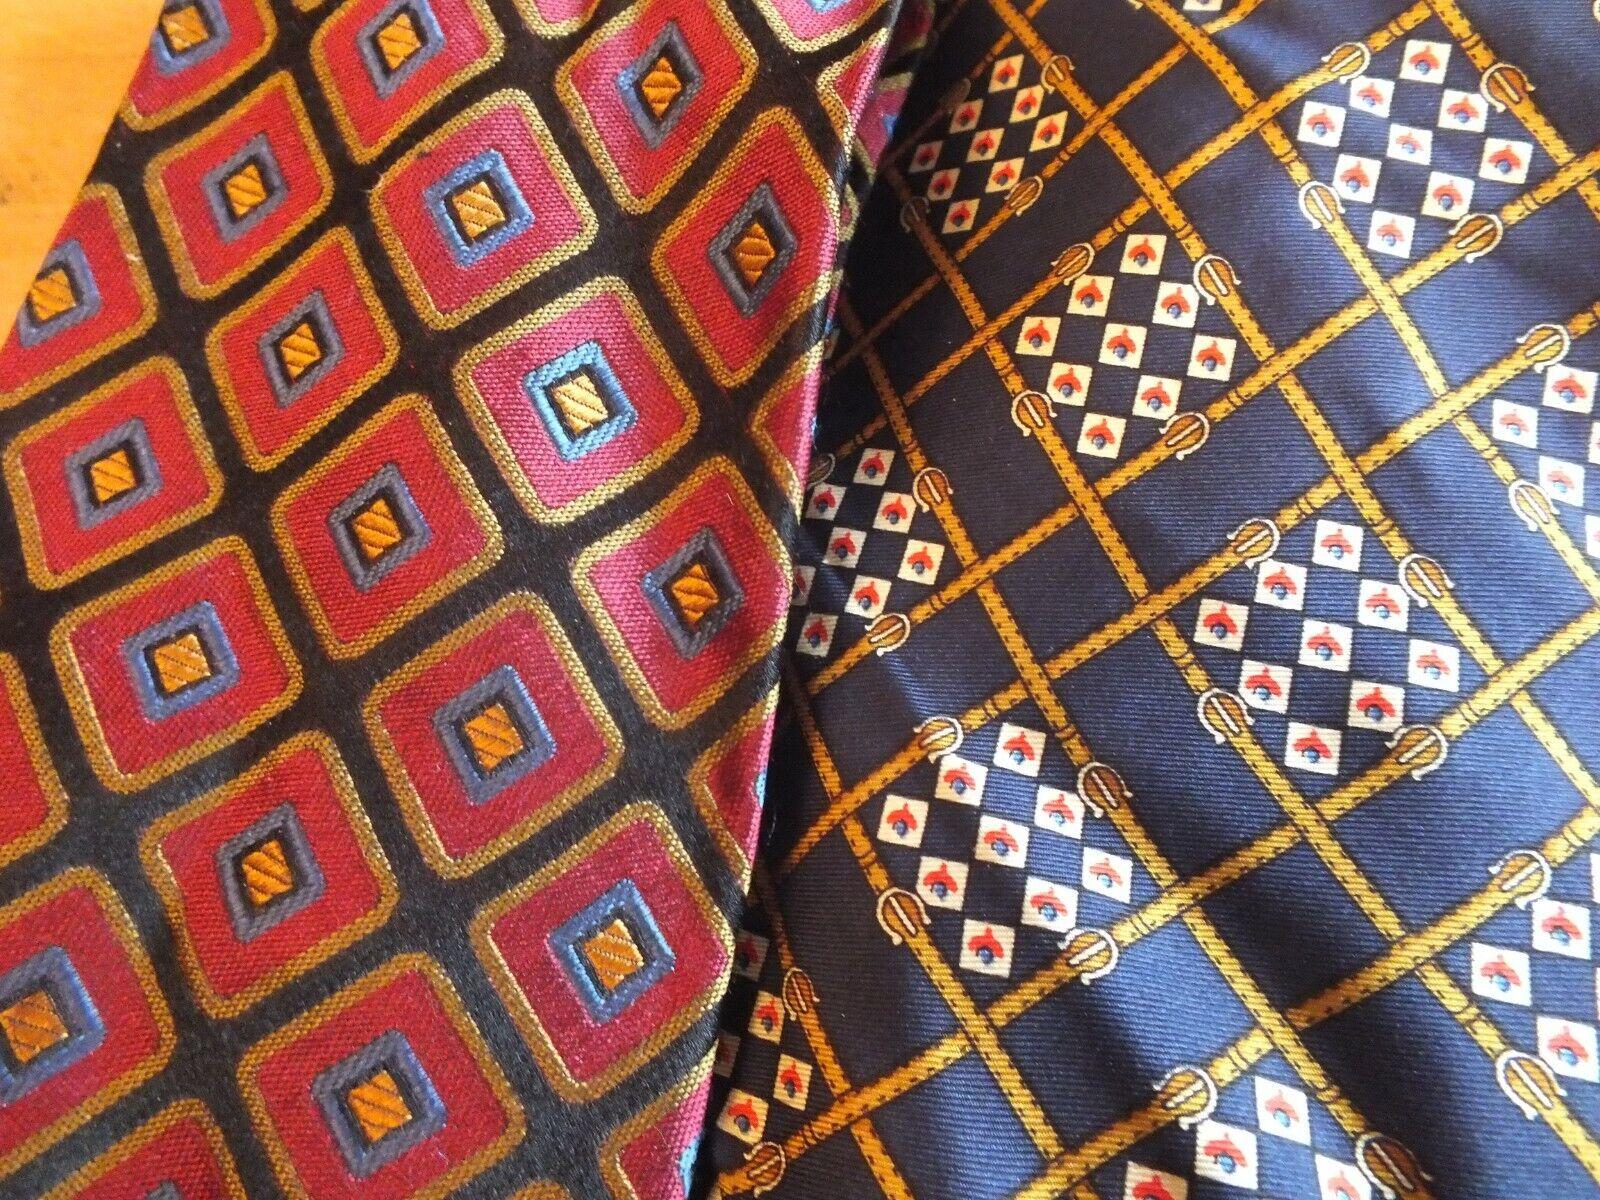 2 x edle Seiden Krawatten 100% Seide, Fasini, Pfau, top Zustand